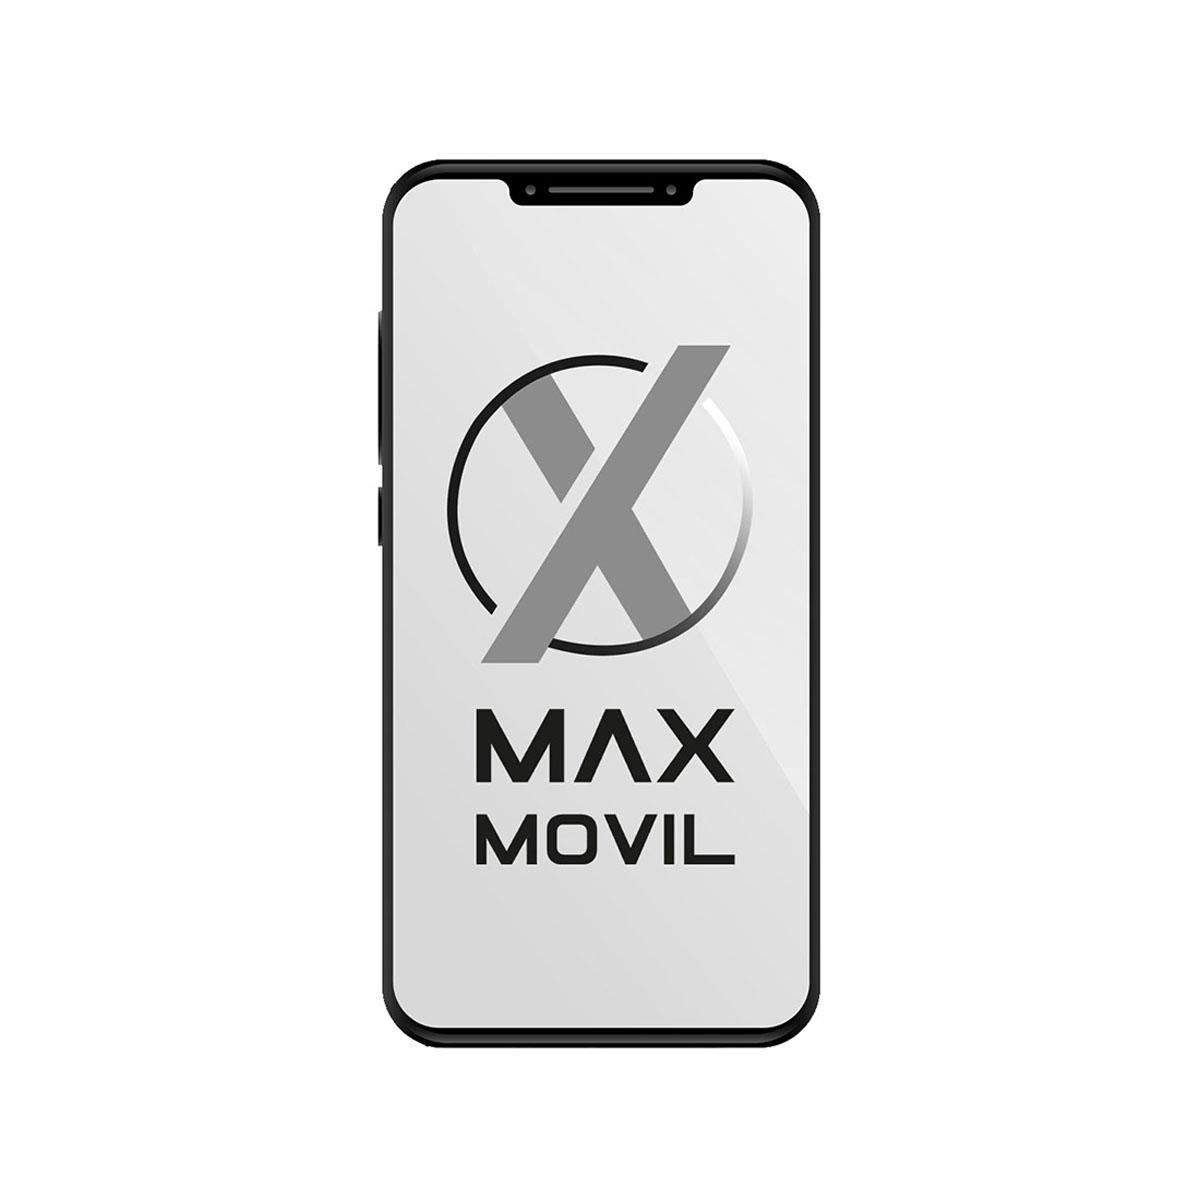 Samsung Galaxy J3 (2016) gold libre en MAXmovil